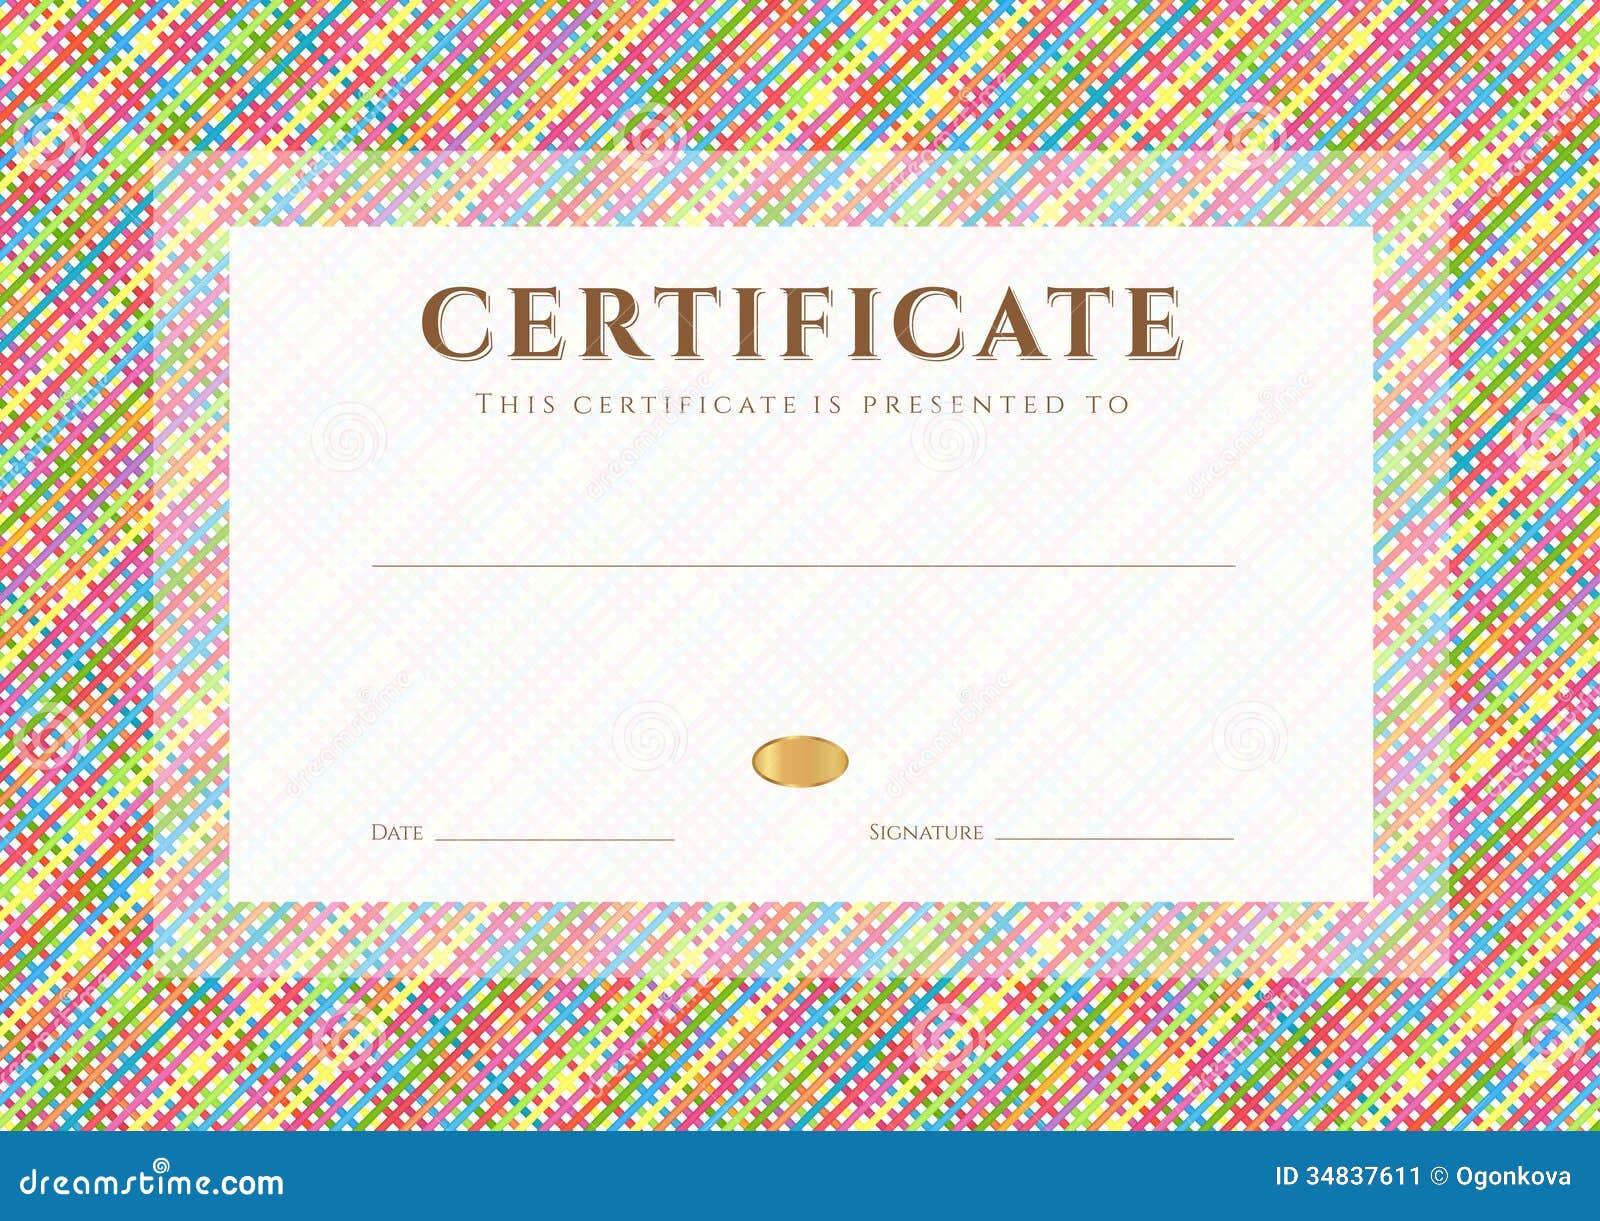 Шаблон награды сертификата диплома Картина Иллюстрация вектора  Шаблон награды сертификата диплома Картина